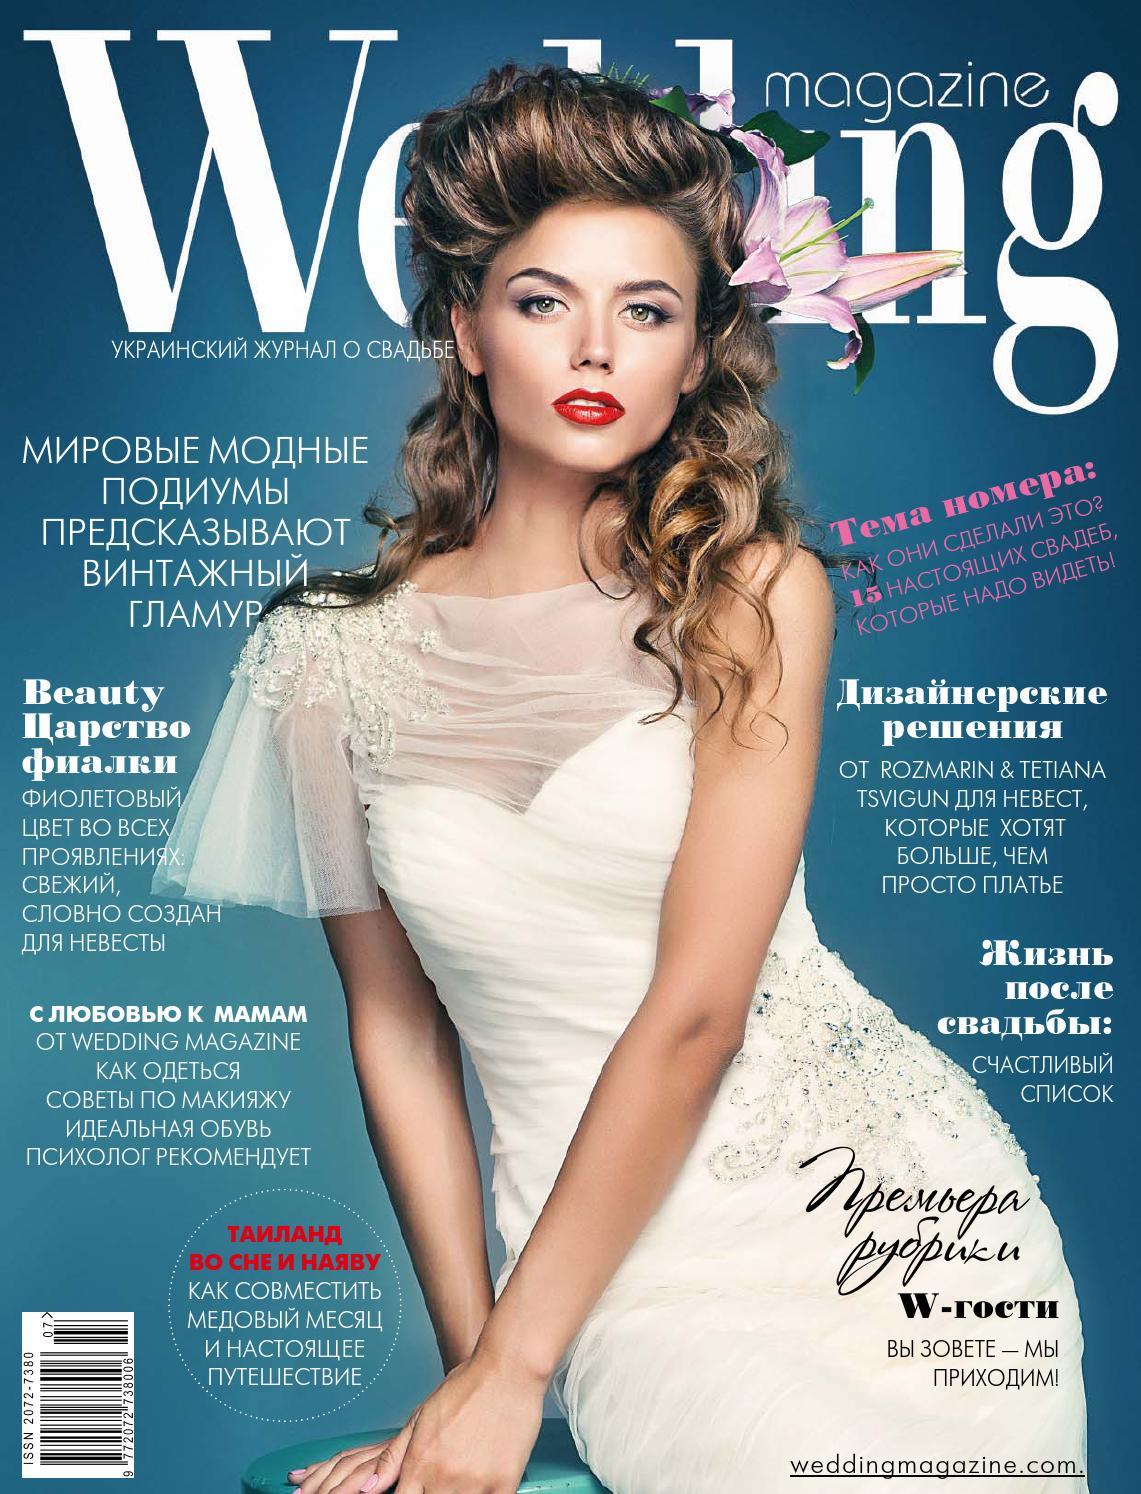 41bd3e5916b2 Wedding magazine  2 2014 by Magazine Wedding - issuu